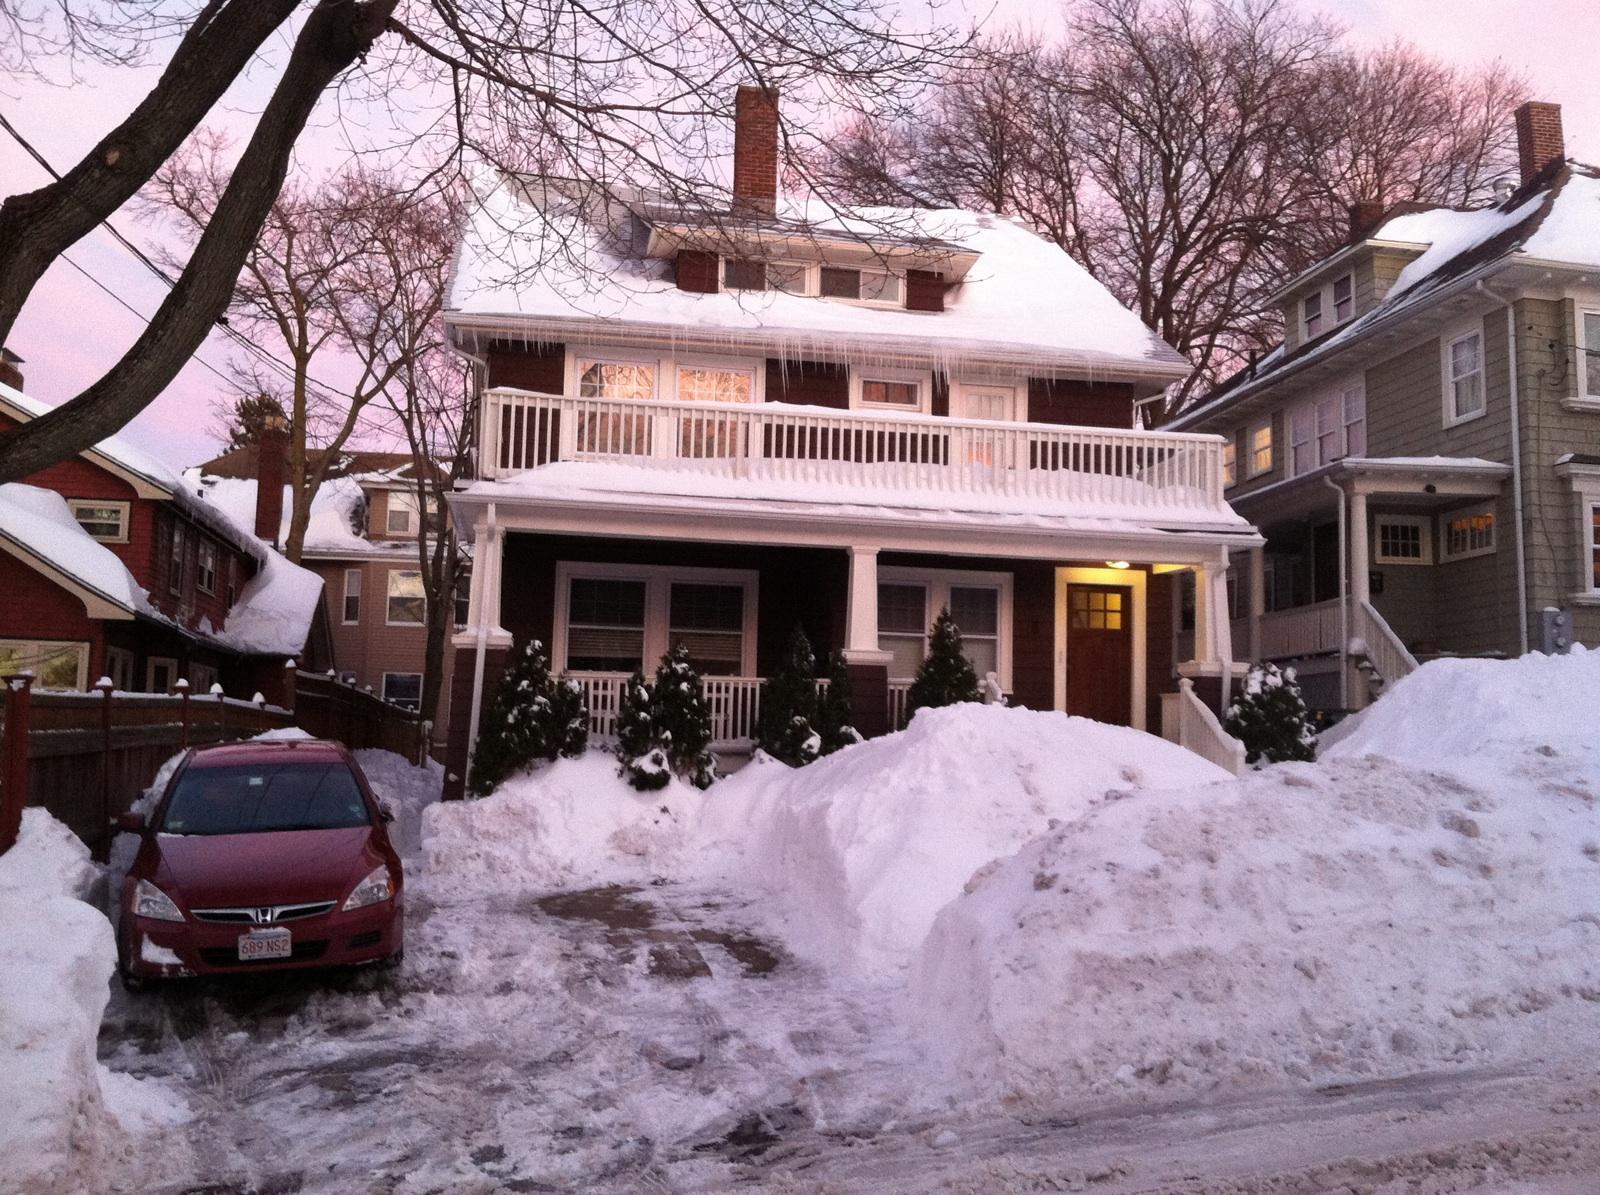 7-foot tall snowpiles!